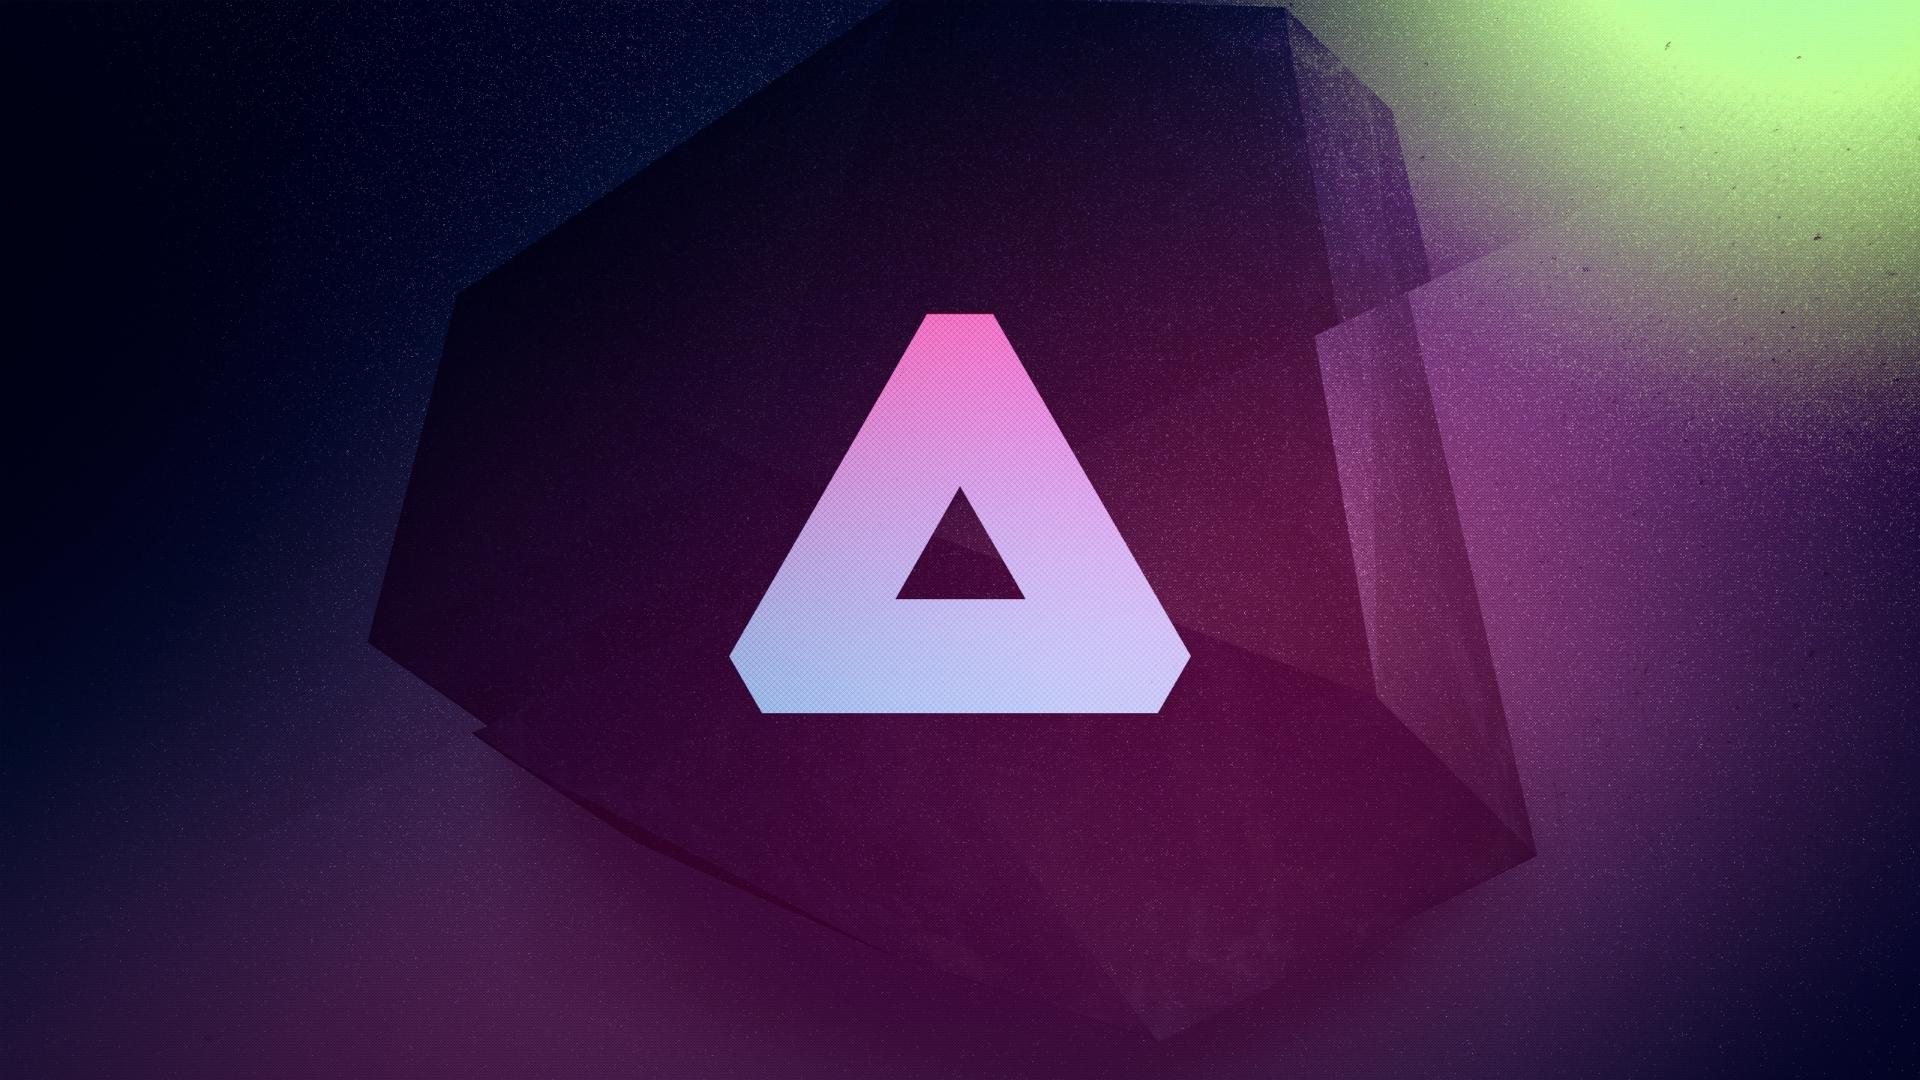 Line Color Form : Wallpaper : illustration red logo symmetry blue triangle